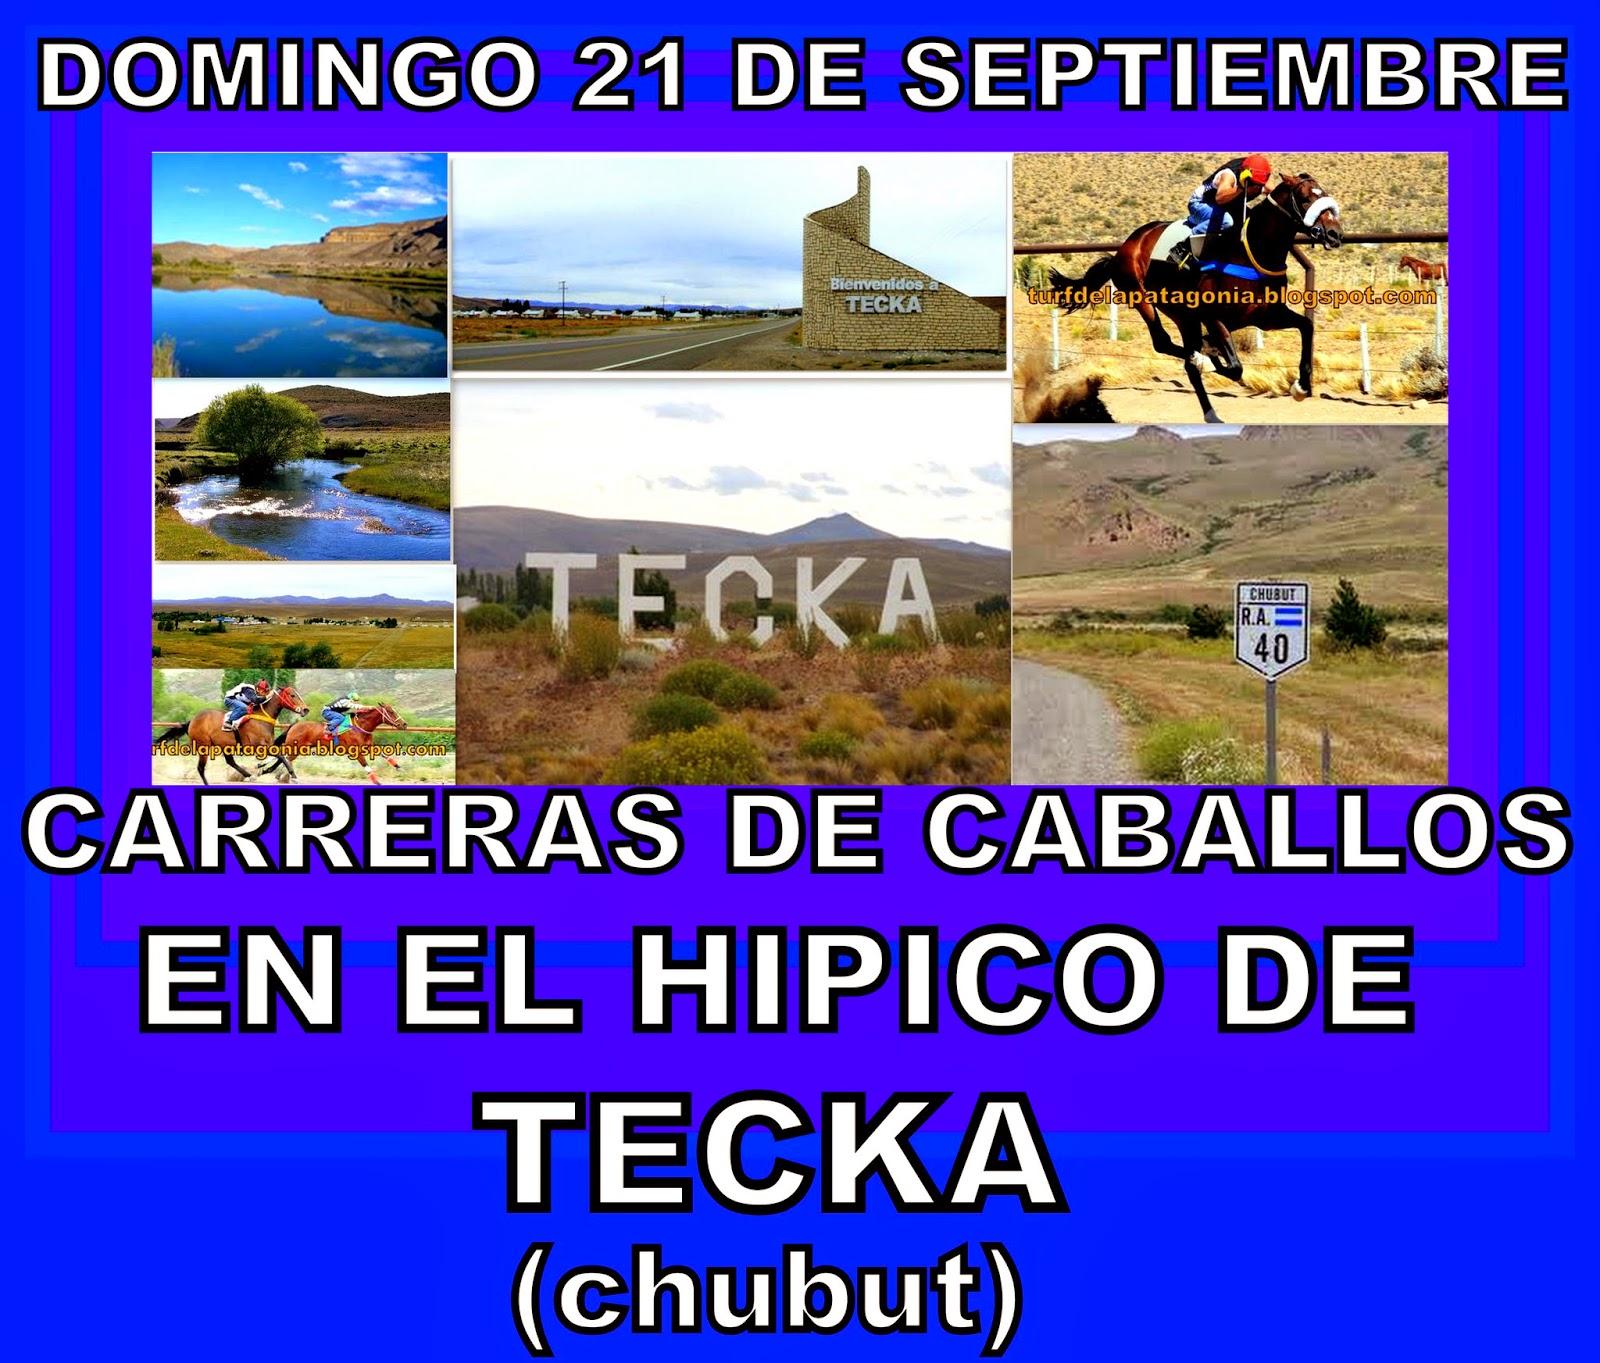 http://turfdelapatagonia.blogspot.com.ar/2014/09/2109-programa-de-carreras-de-caballos.html